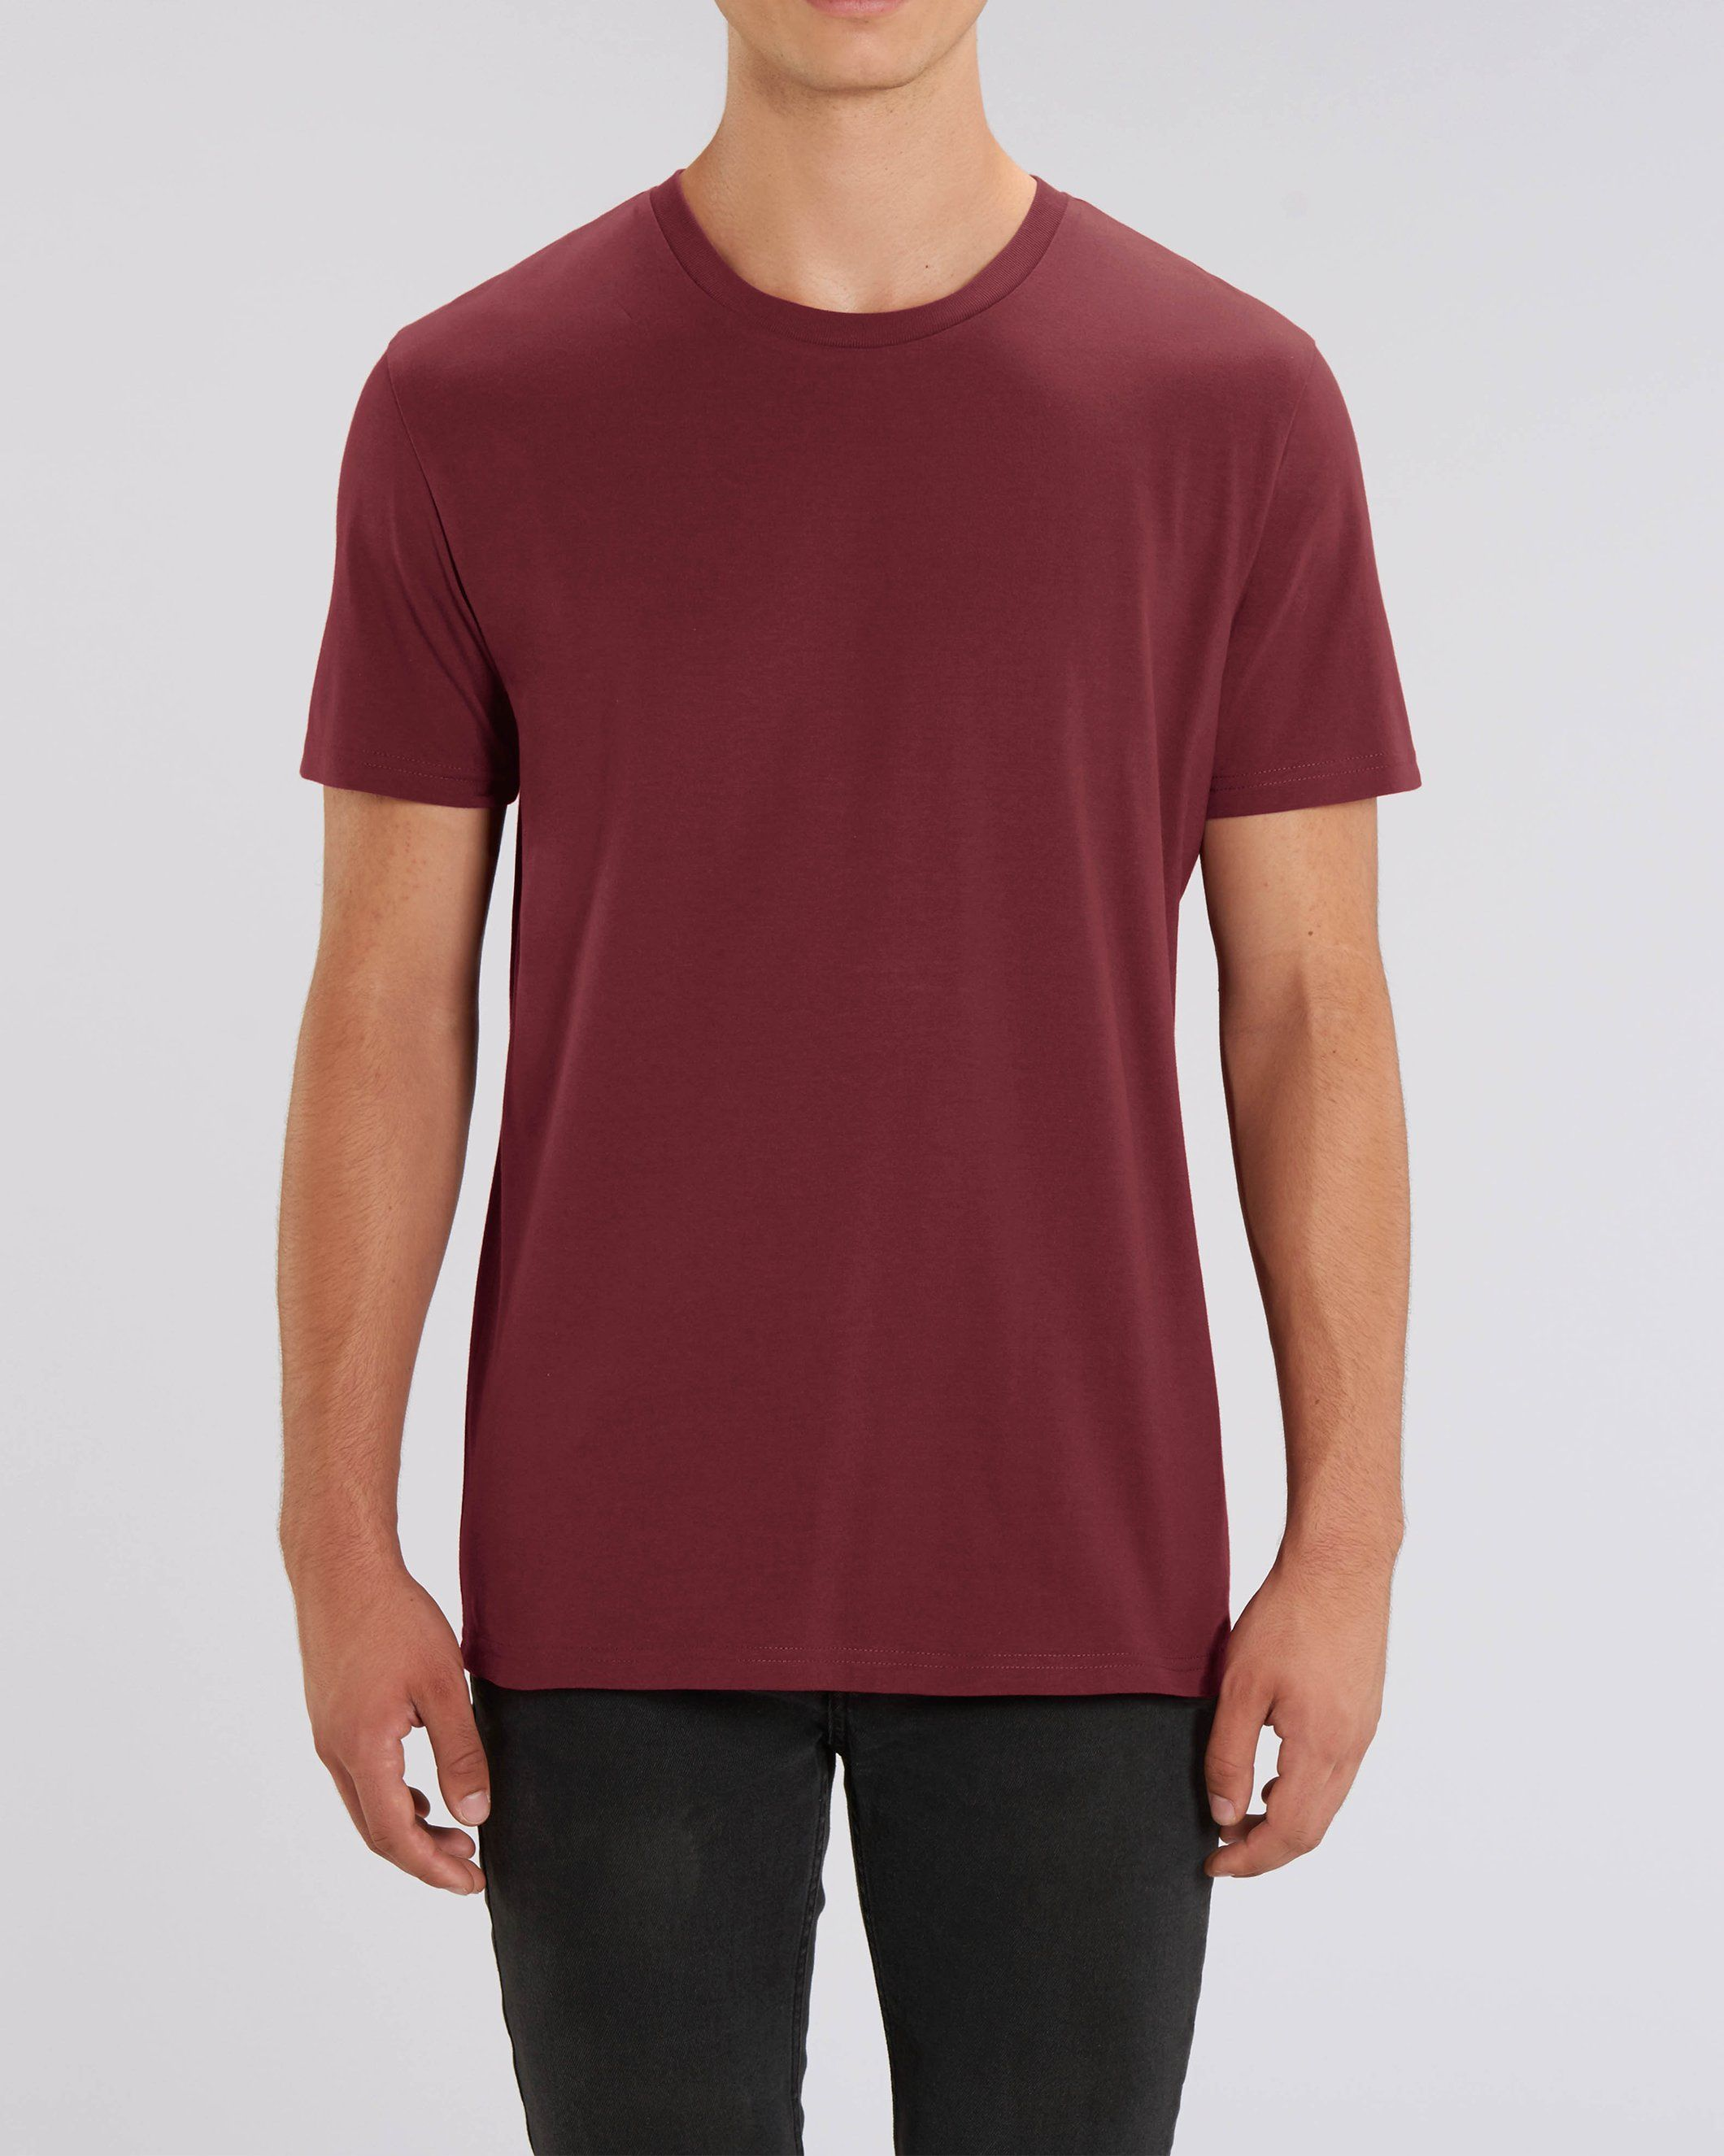 Nauli Unisex Regular Fit T-Shirt in Burgundy